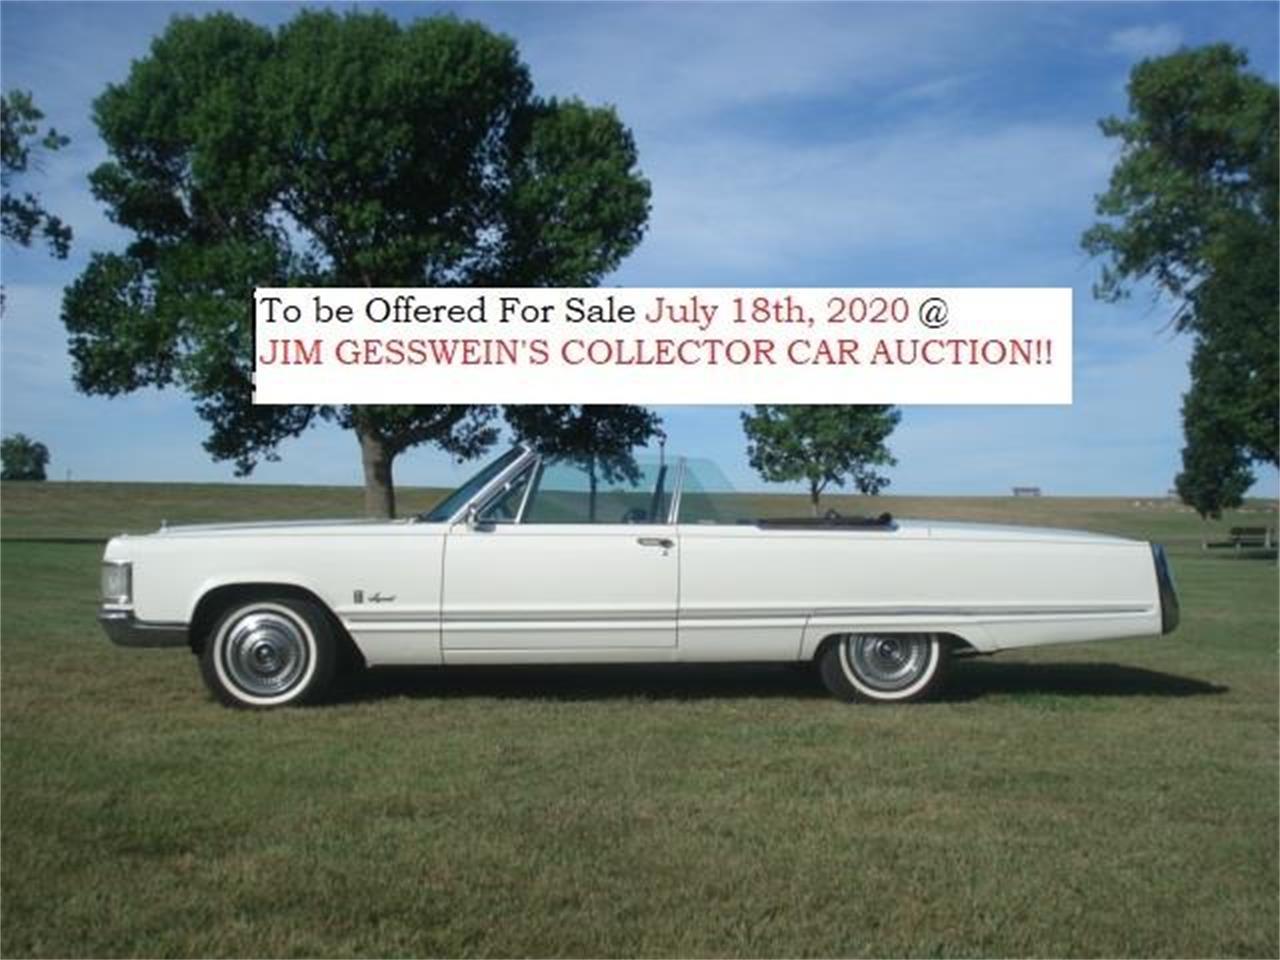 1967 Chrysler Imperial Crown (CC-1330185) for sale in Milbank, South Dakota